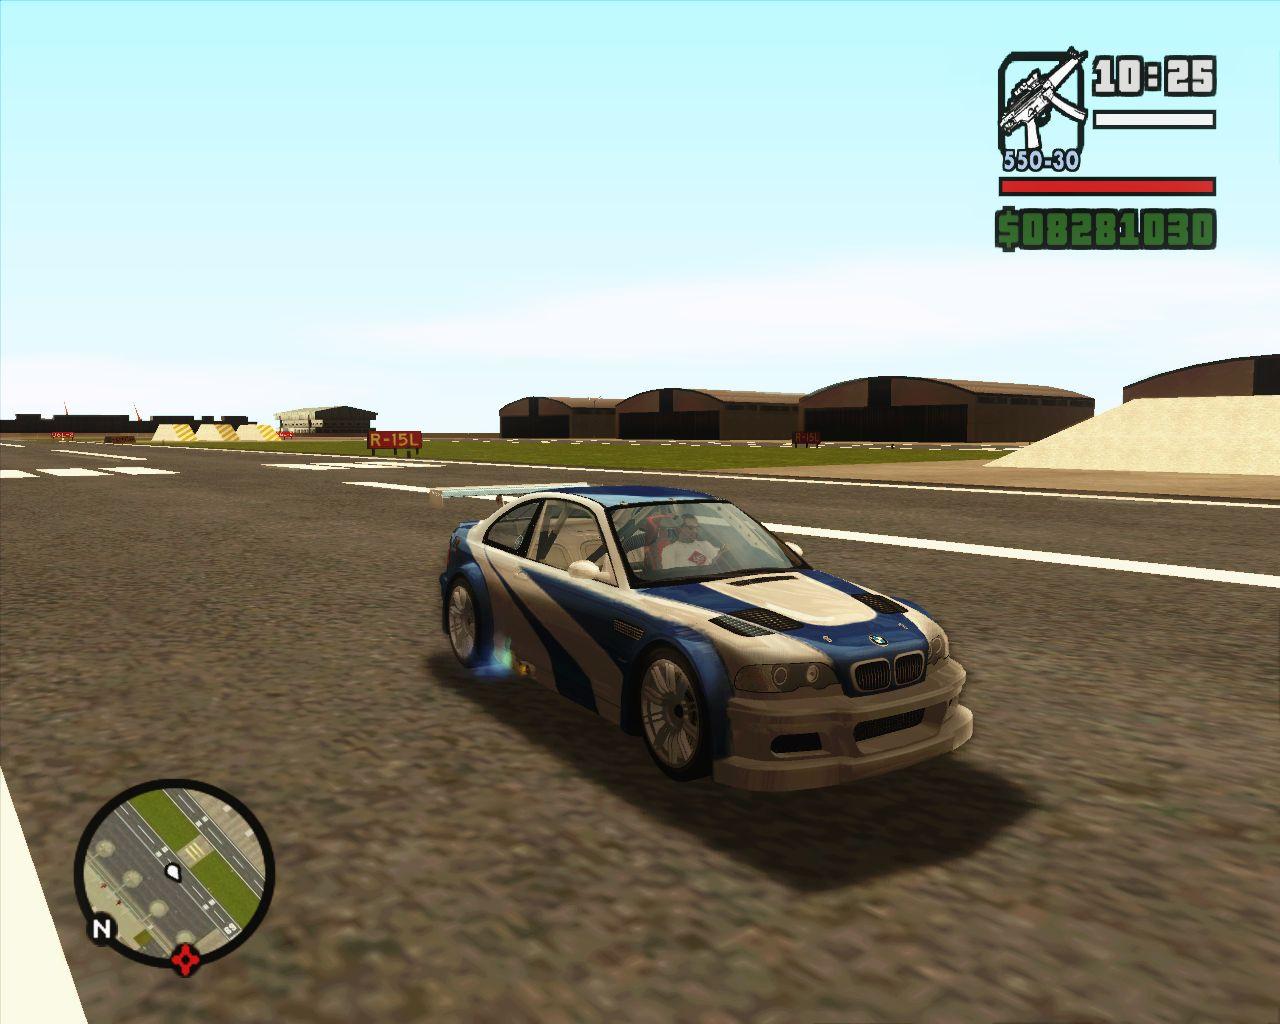 gta_sa 2008-04-12 21-37-39-68.jpg - Grand Theft Auto: San Andreas